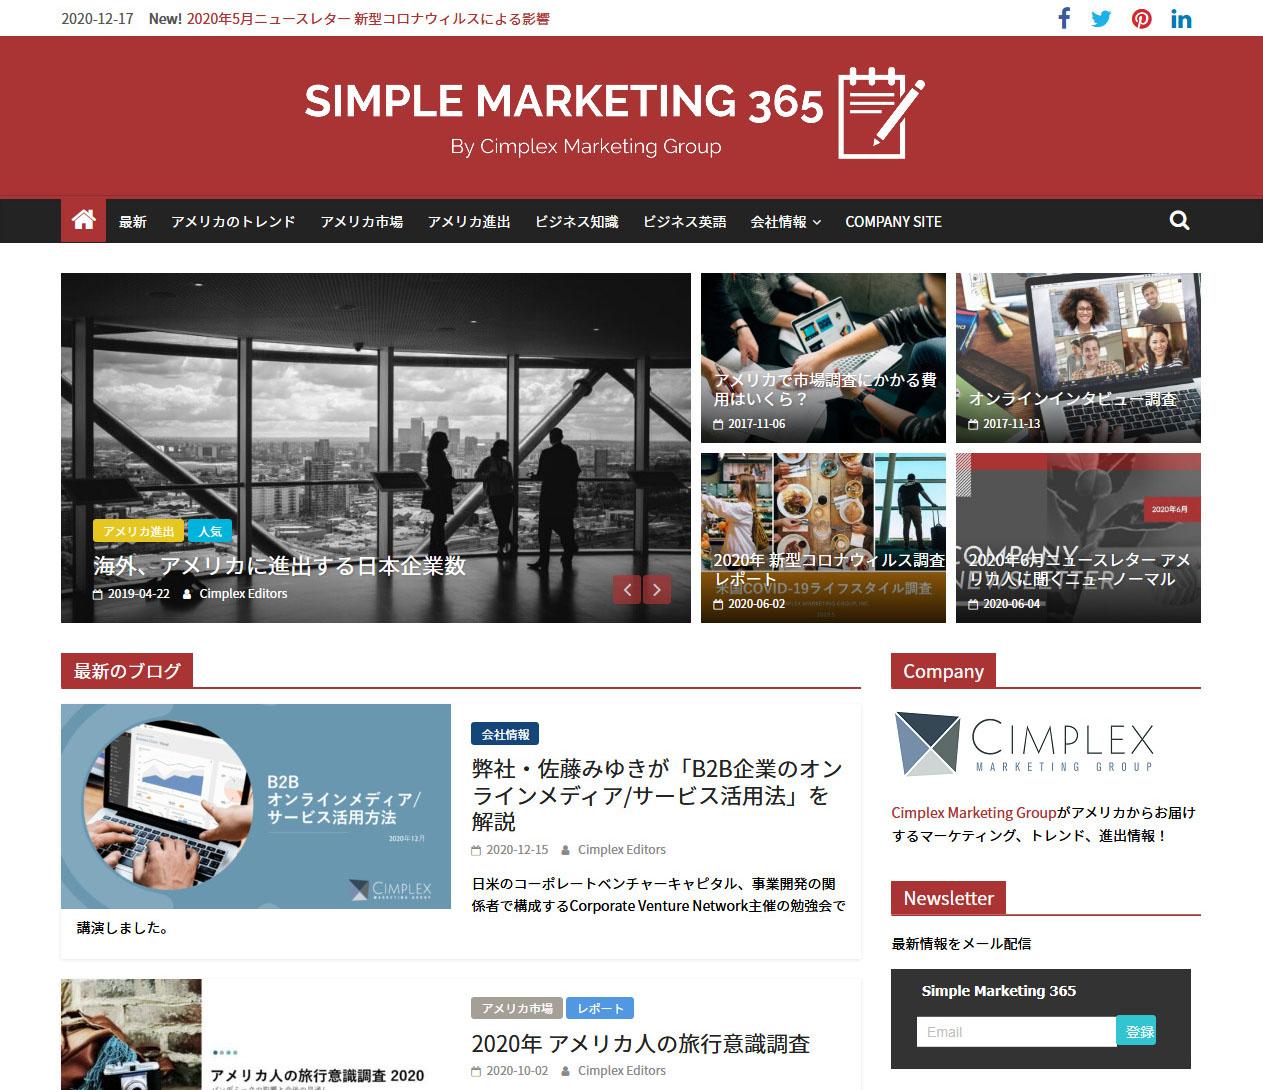 Simple Marketing 365